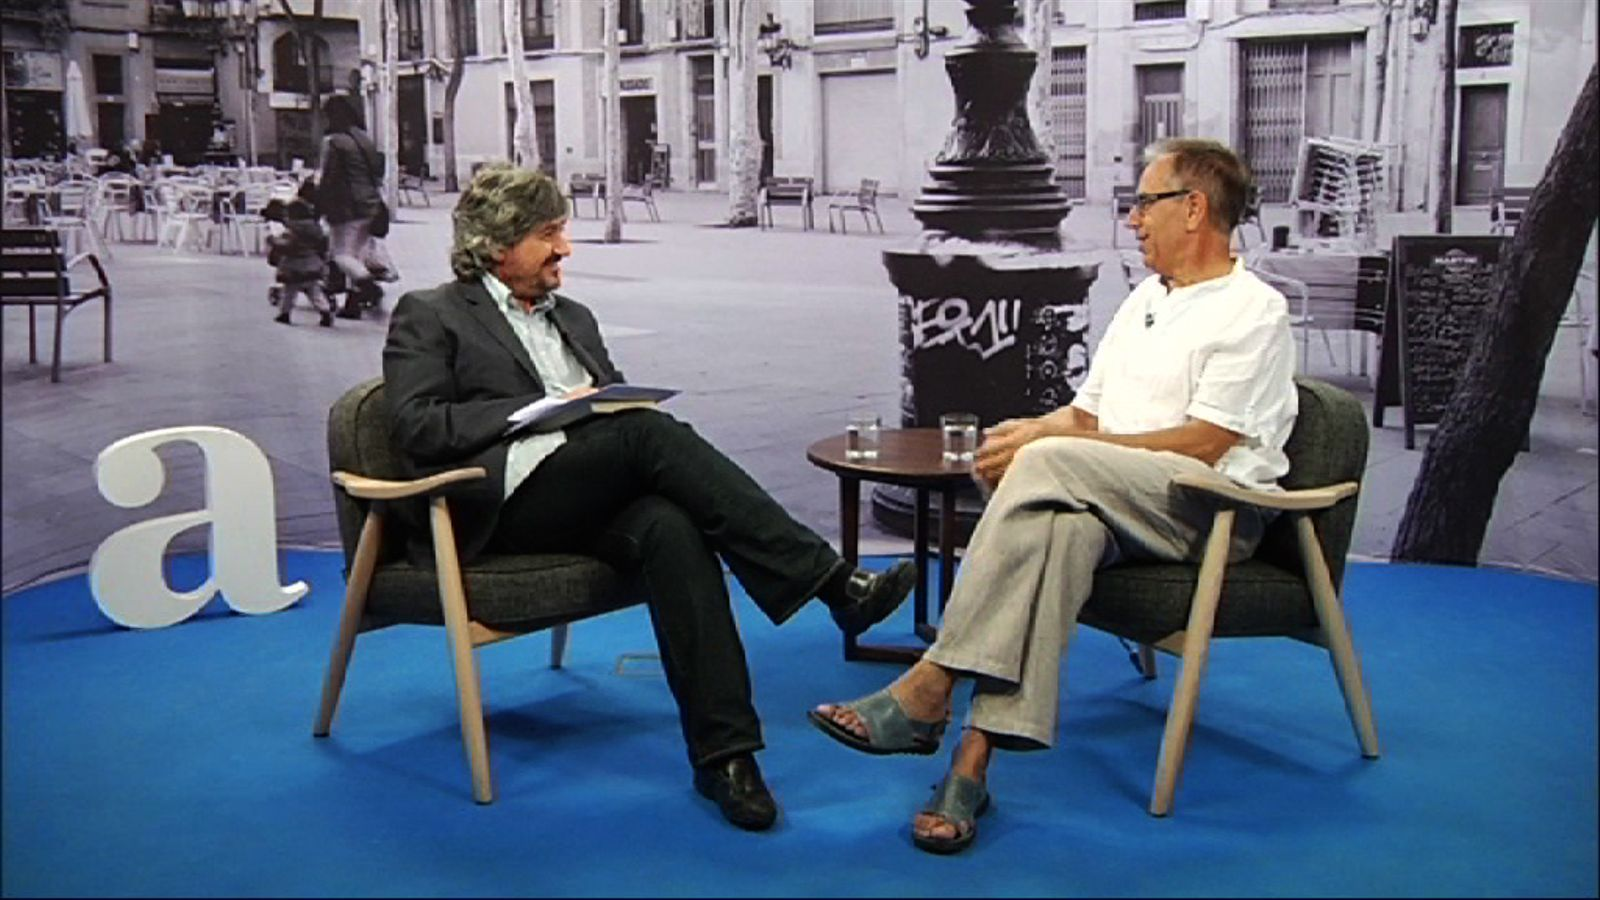 Entrevista de Carles Capdevila a Jaume Funes